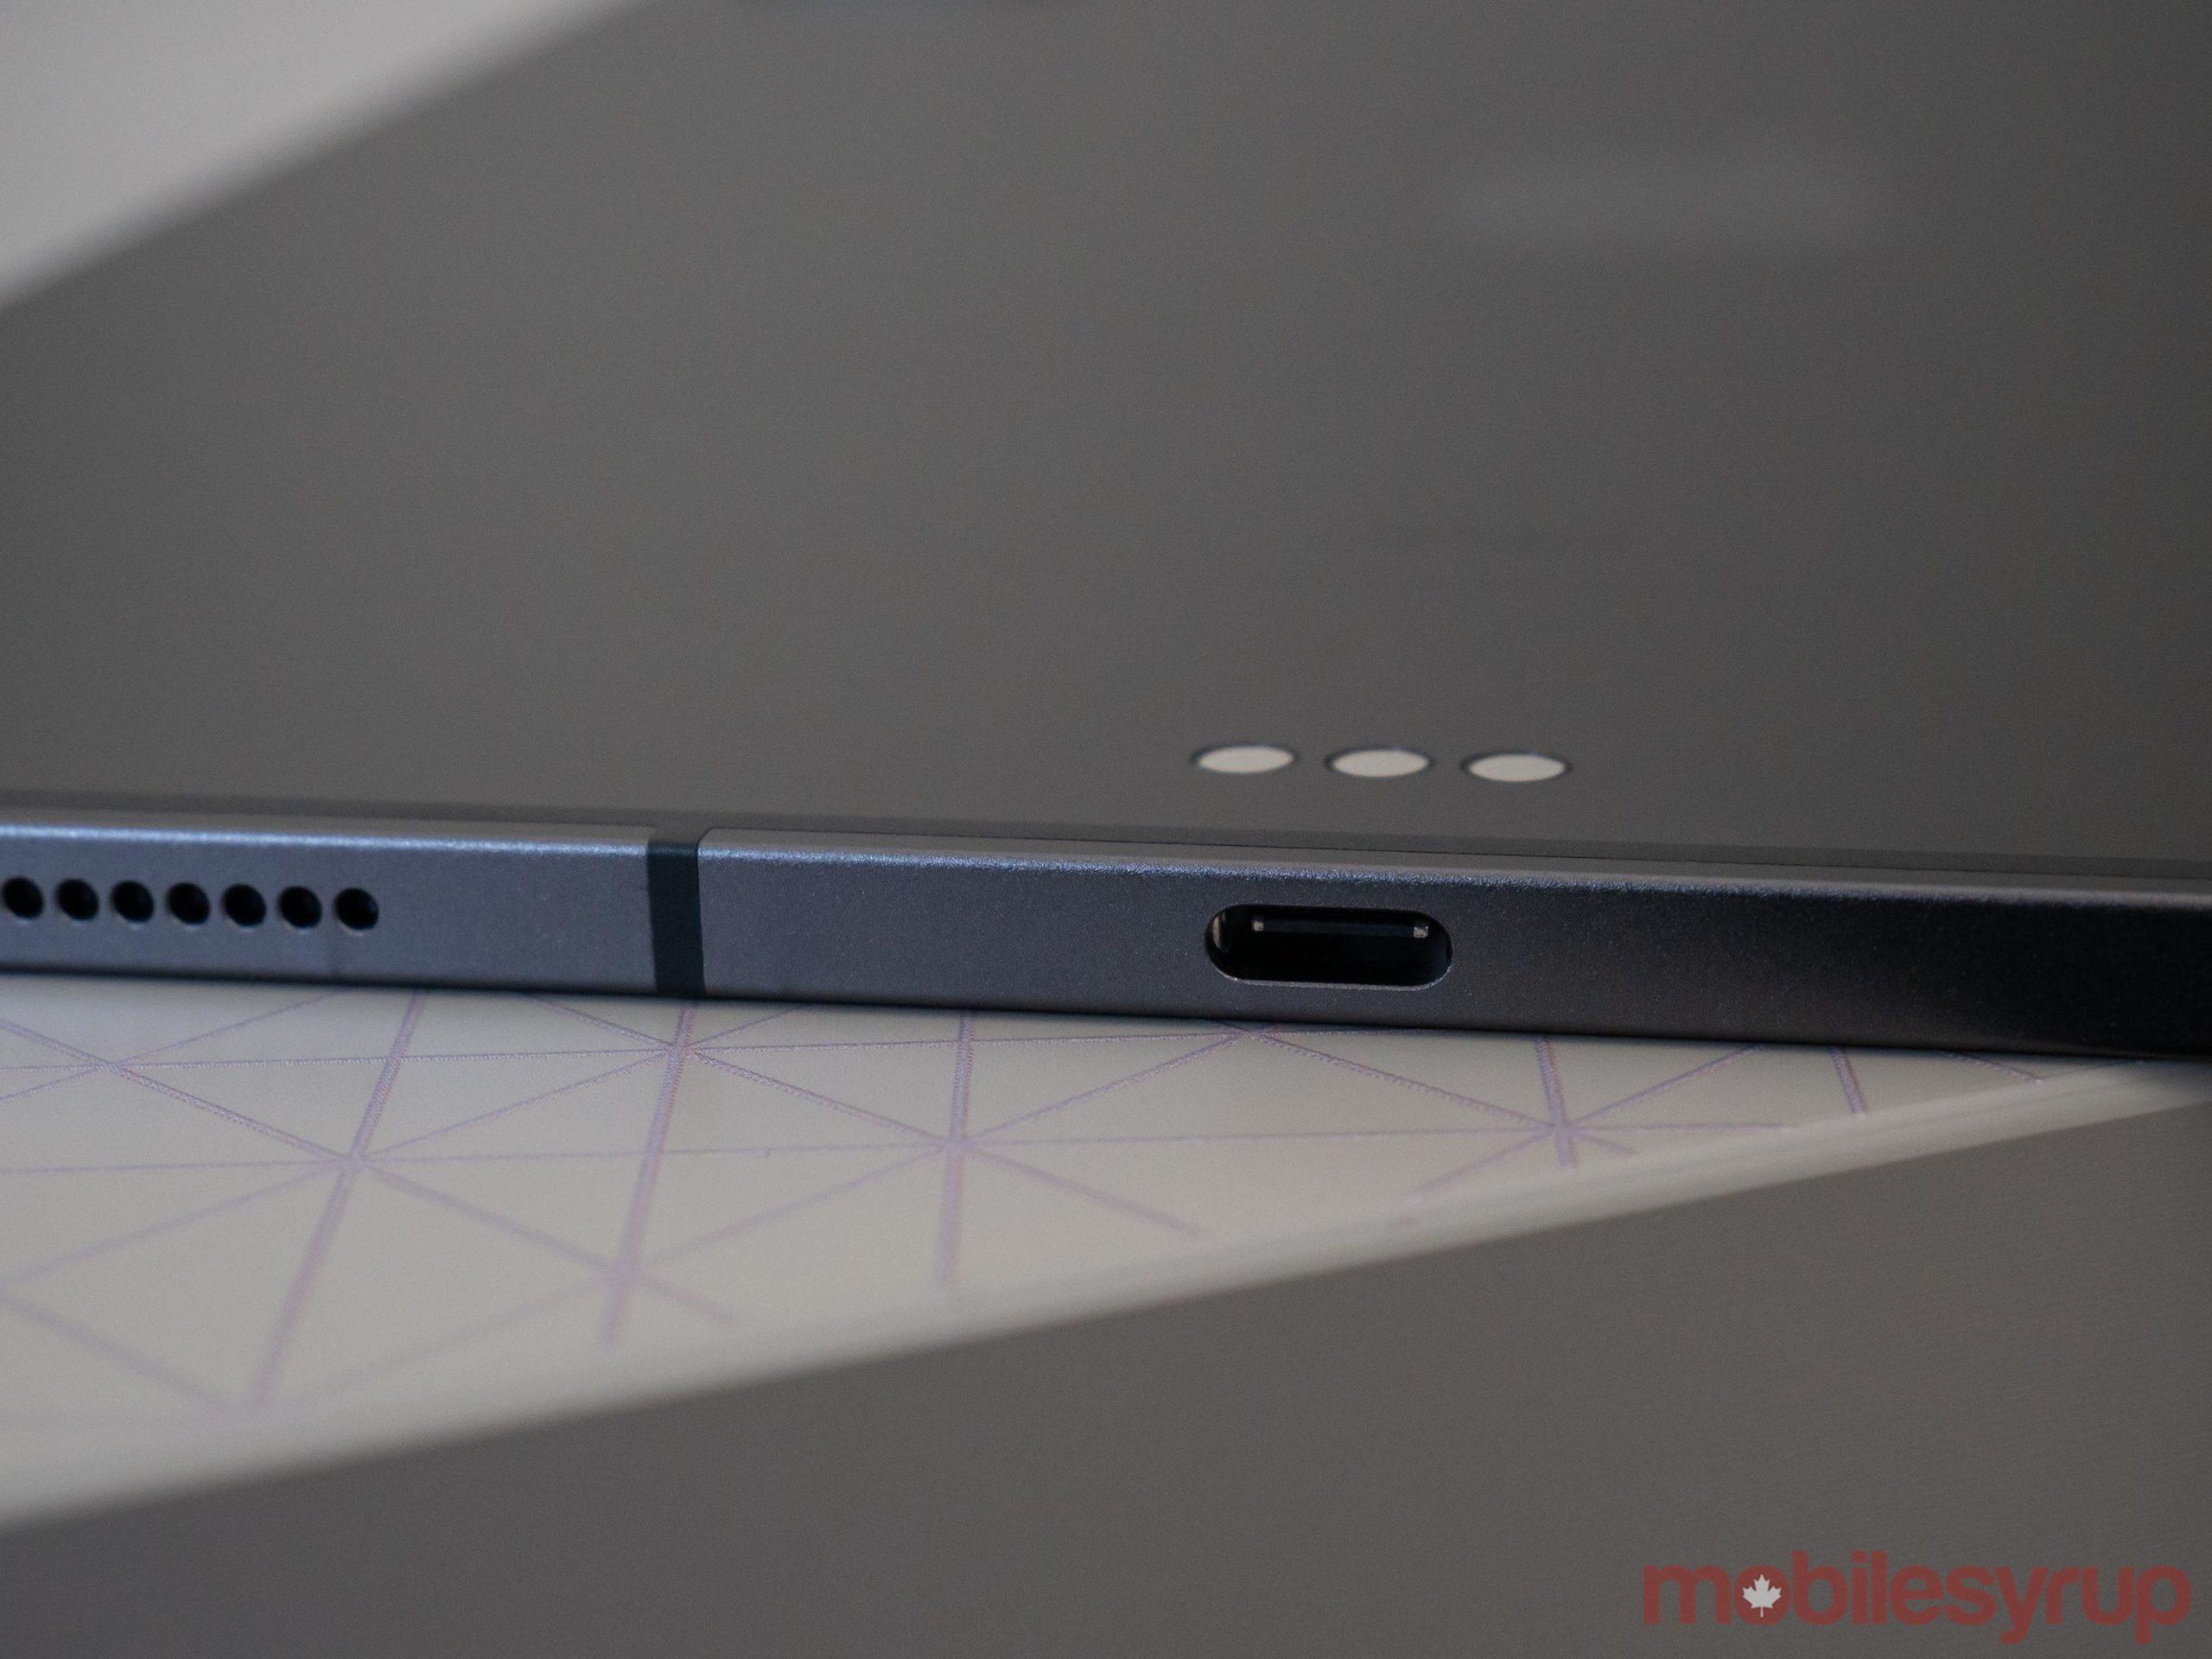 iPad Pro (2020) USB-C port